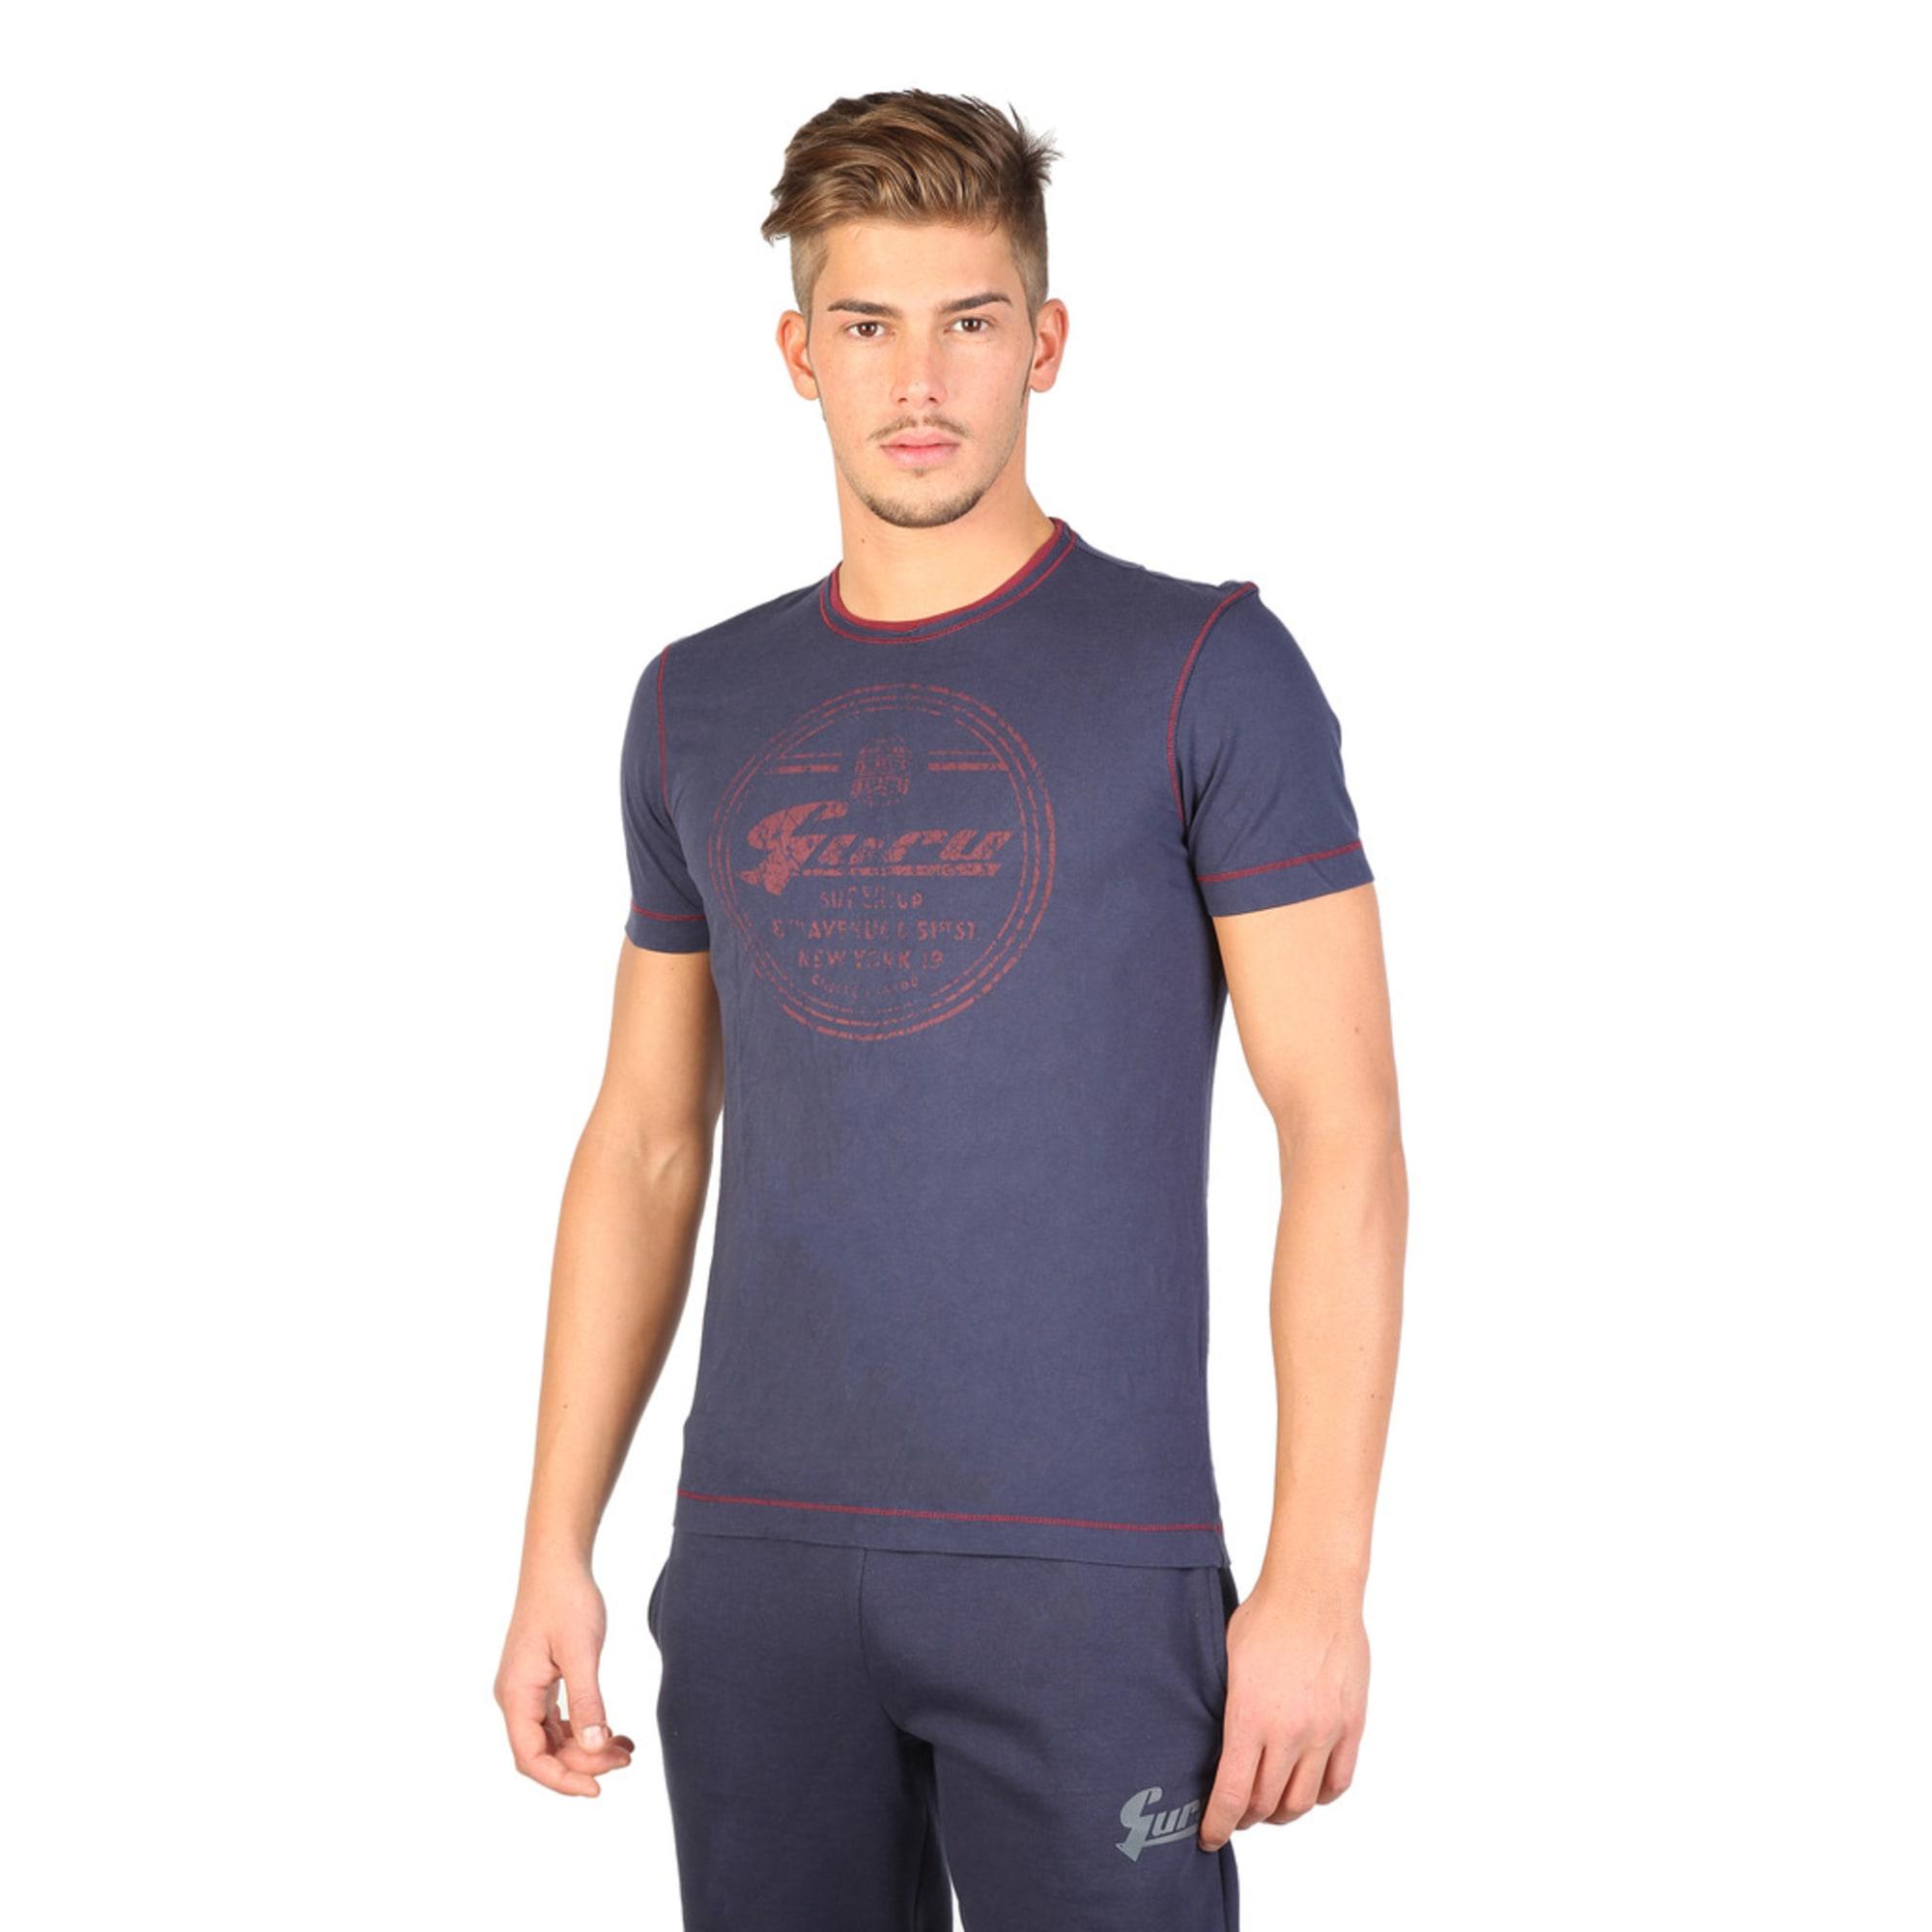 Tee-shirt GURU Bleu, bleu marine, bleu turquoise